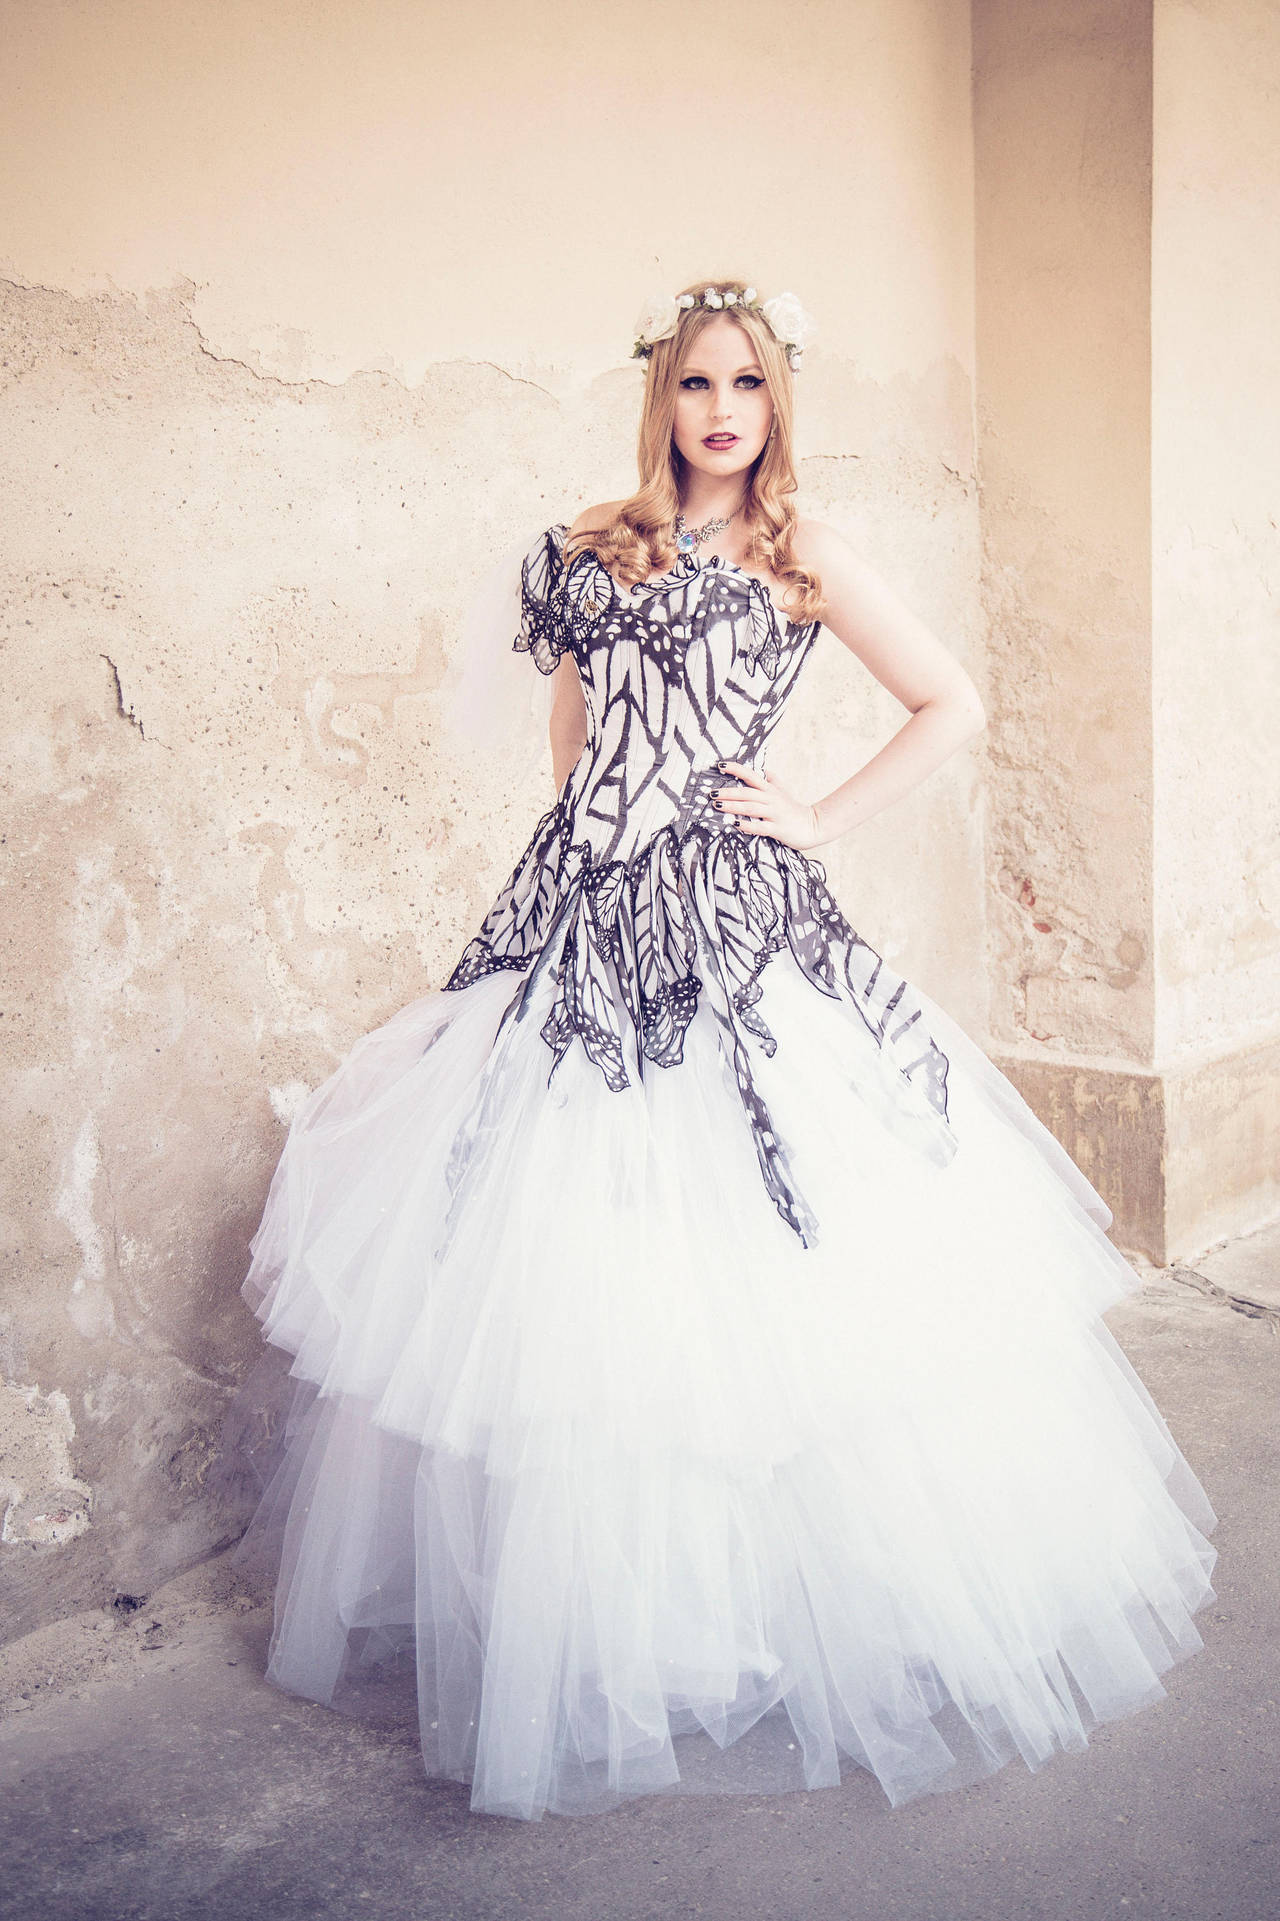 Oniric Princess by Kristhania